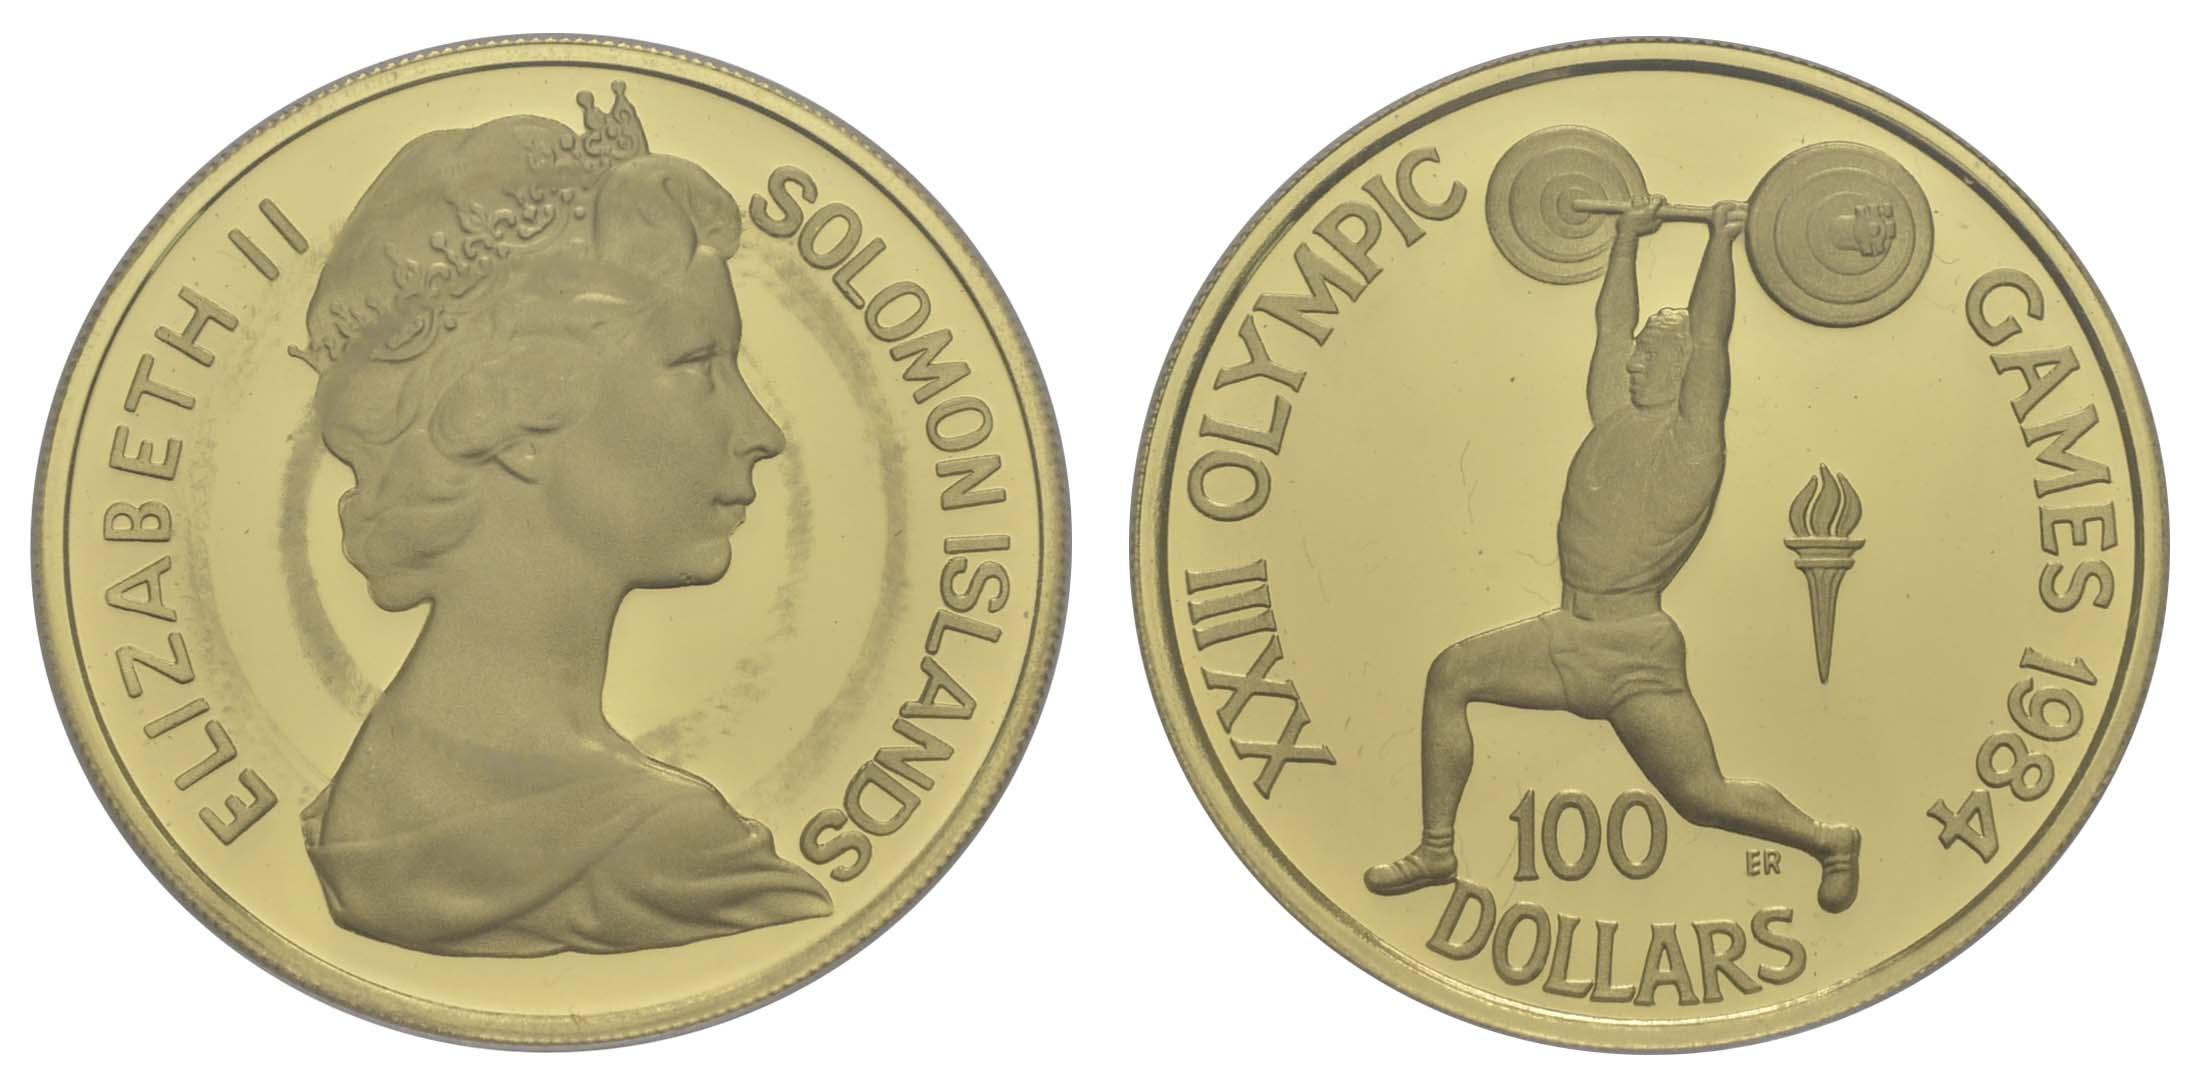 Lot 2095 - übersee Solomonen -  Auktionshaus Ulrich Felzmann GmbH & Co. KG Coins single lots